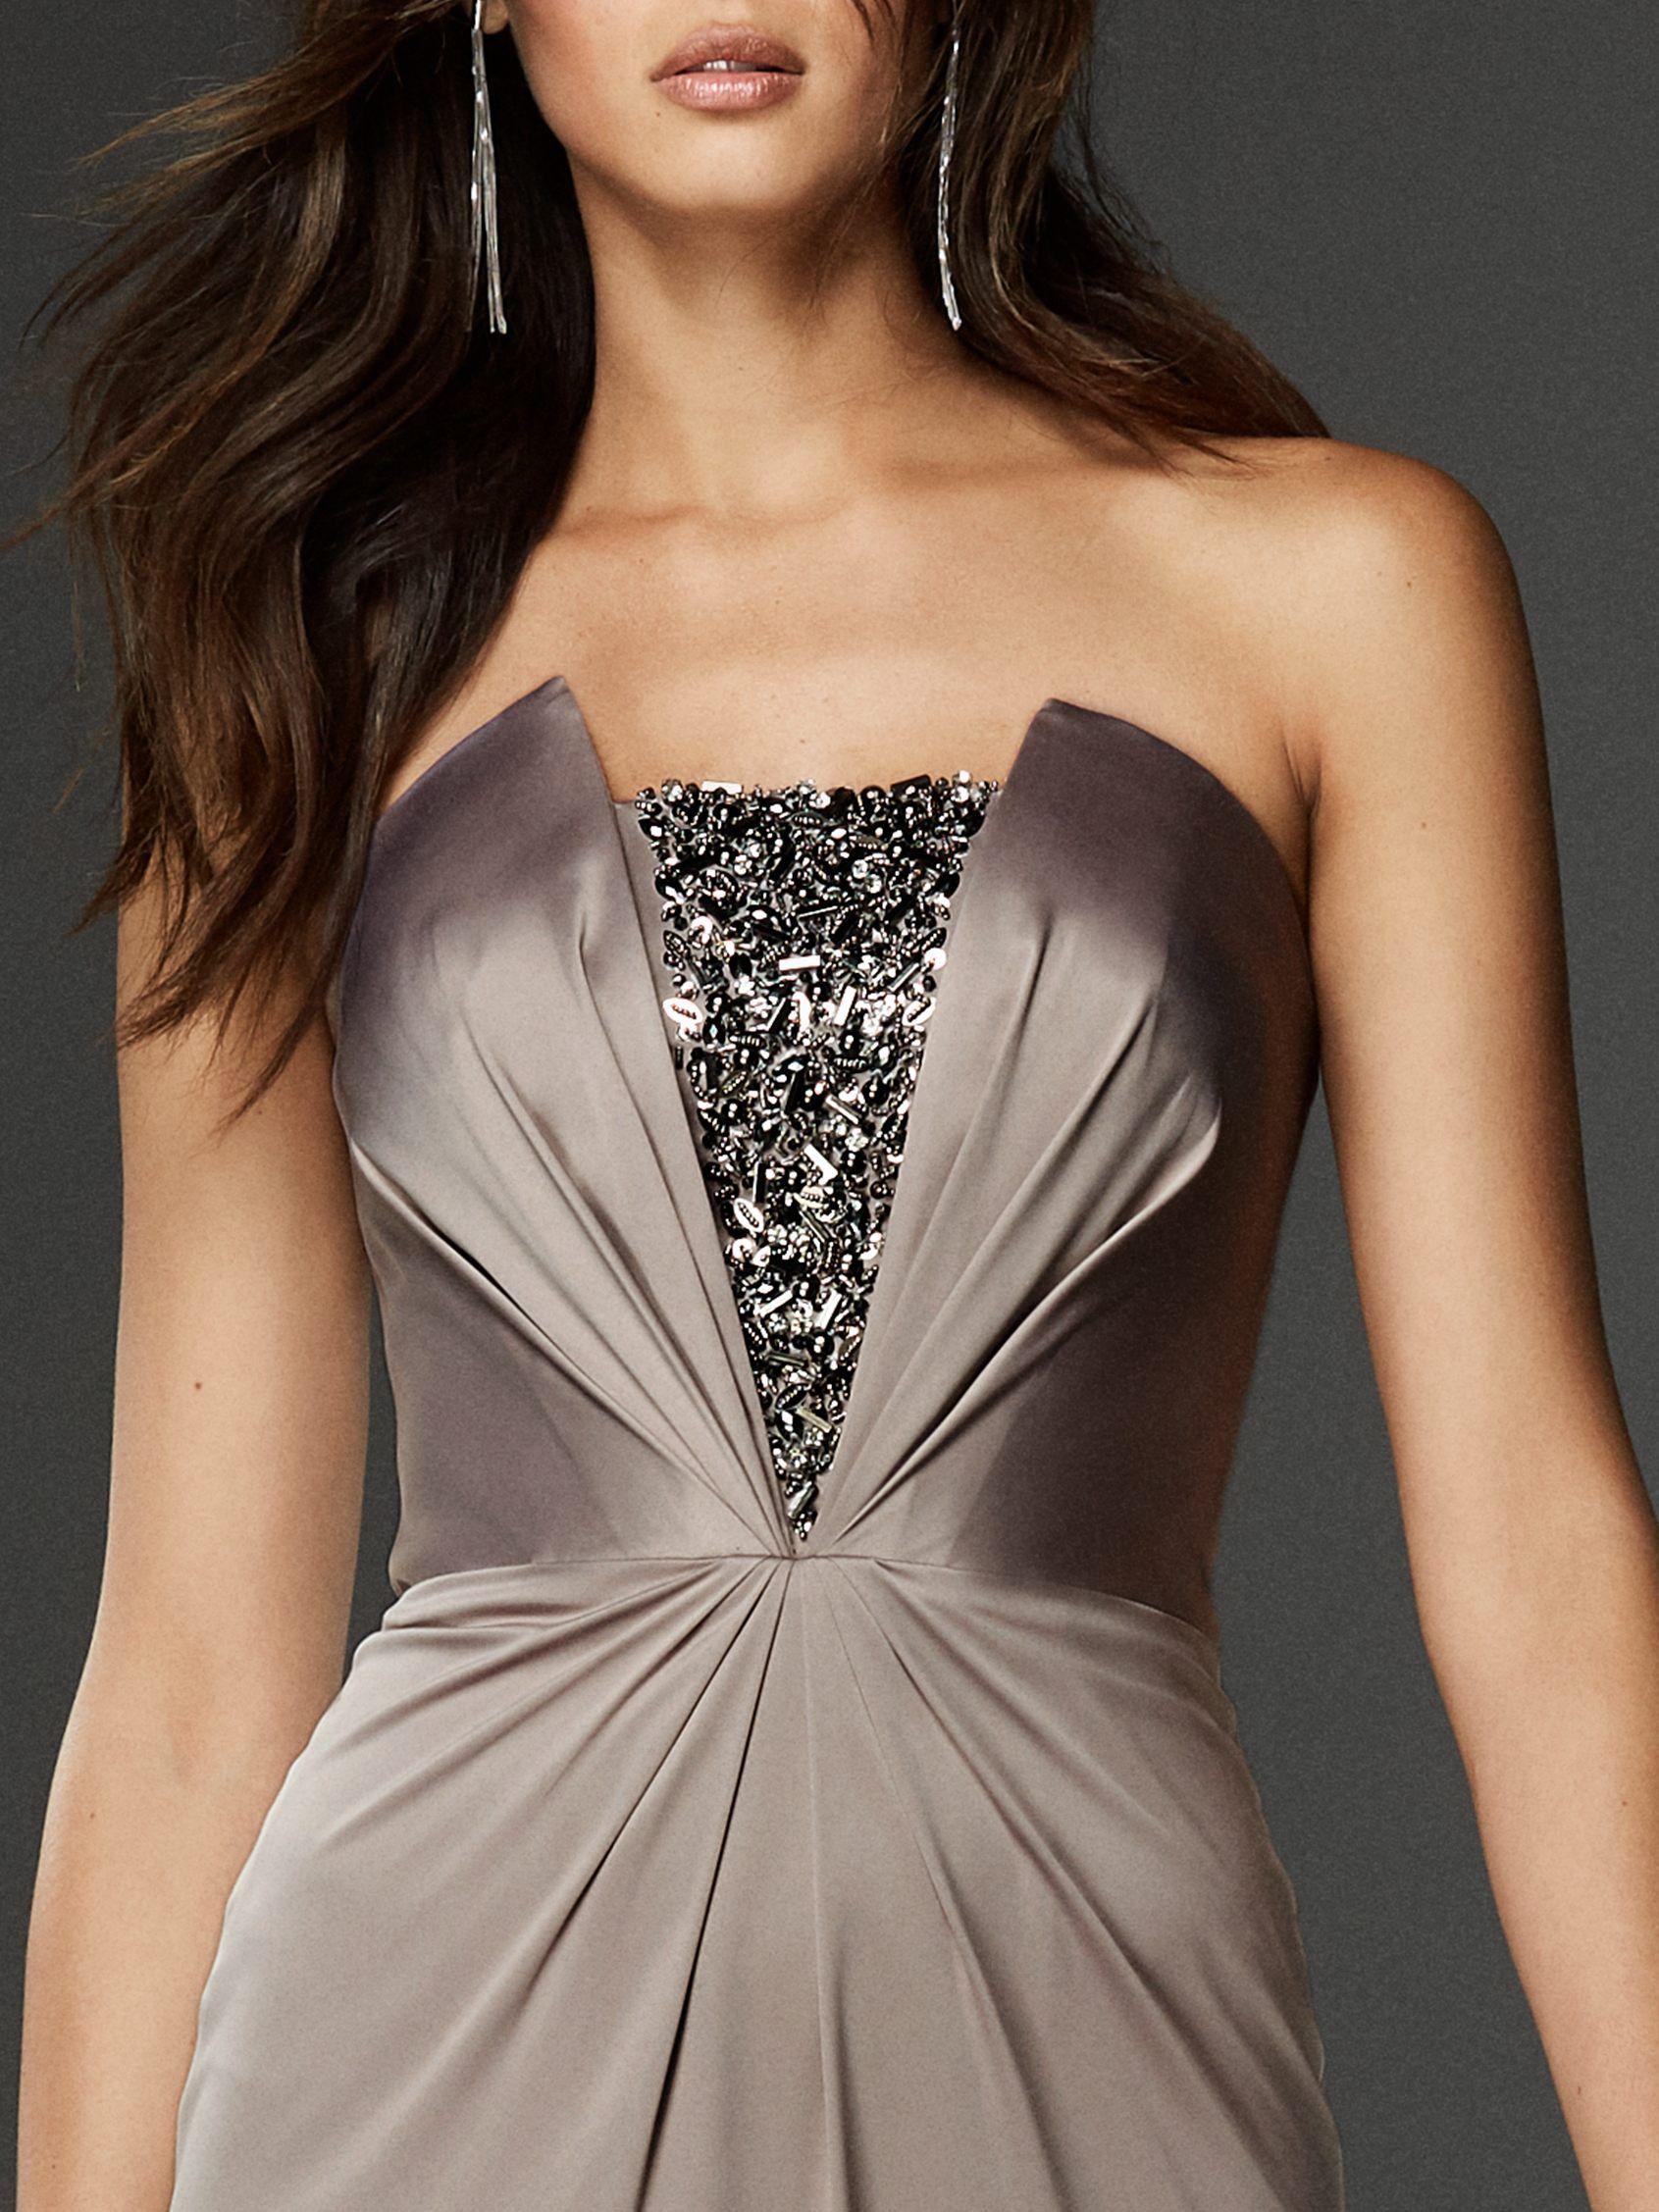 Strapless Formal Dress In Satin Pronovias Strapless Dress Formal Strapless Sheath Dress Evening Dresses [ 2255 x 1691 Pixel ]